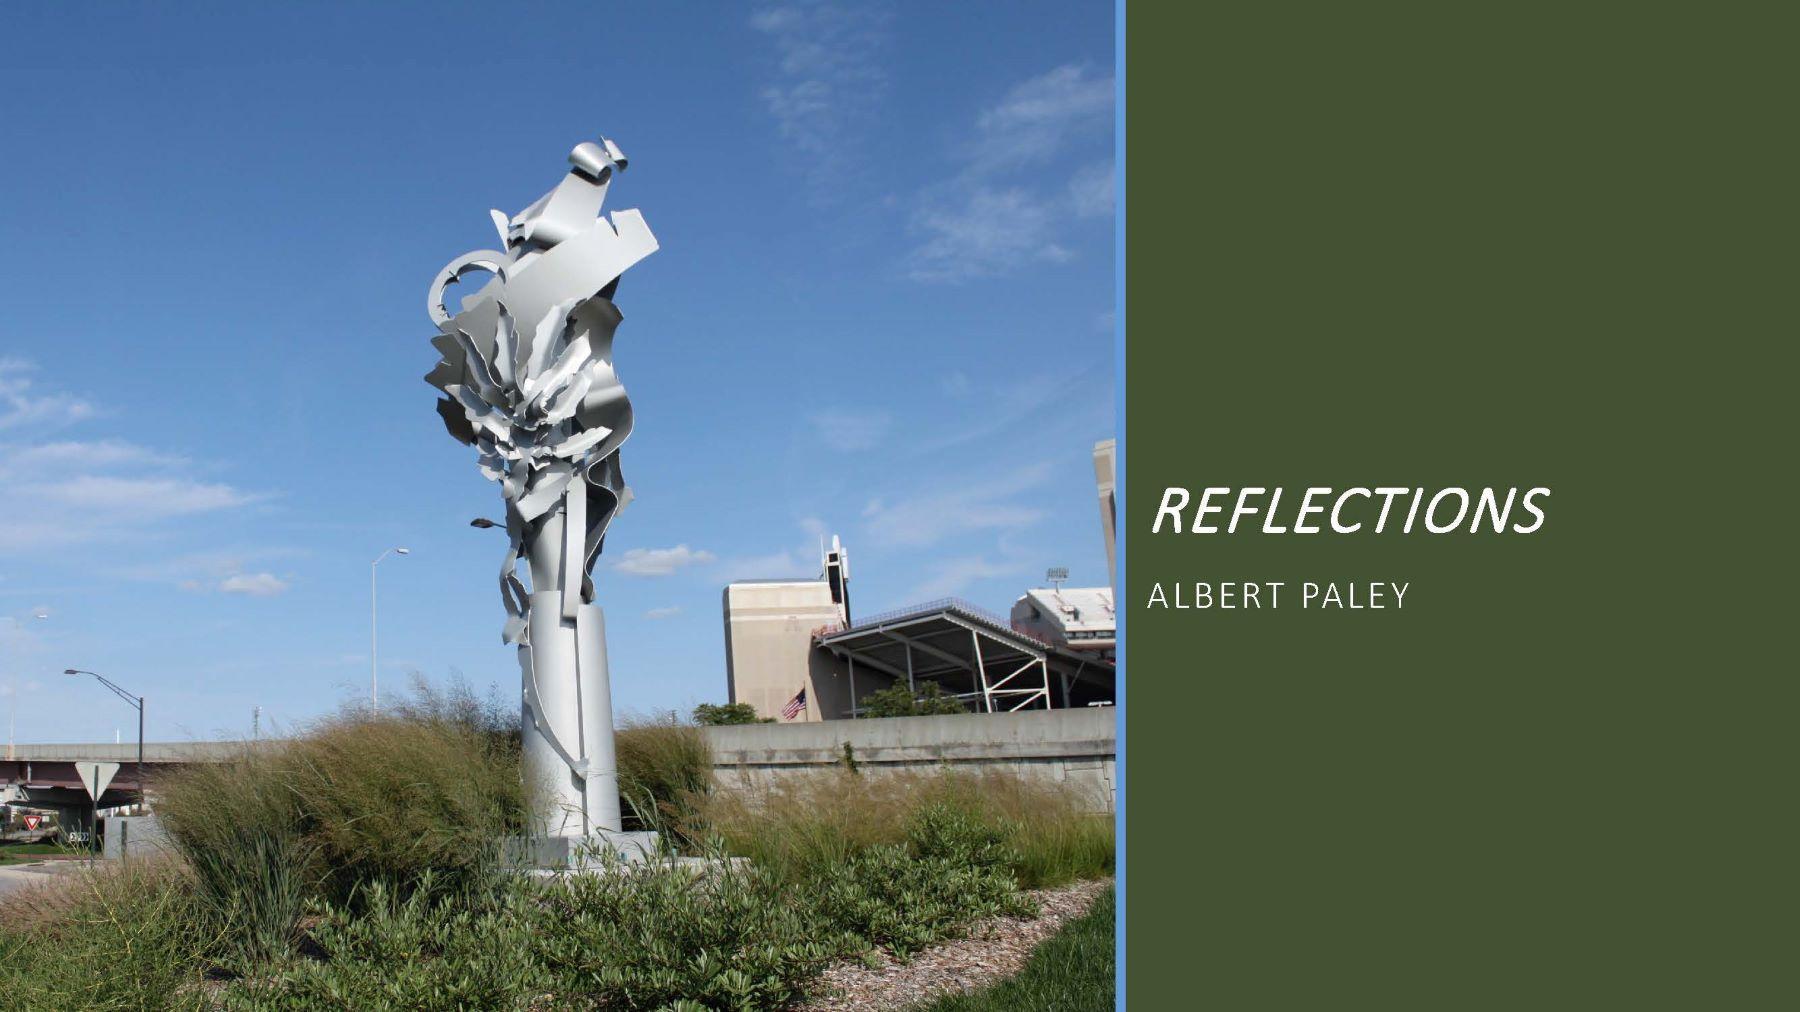 Reflections / Albert Paley